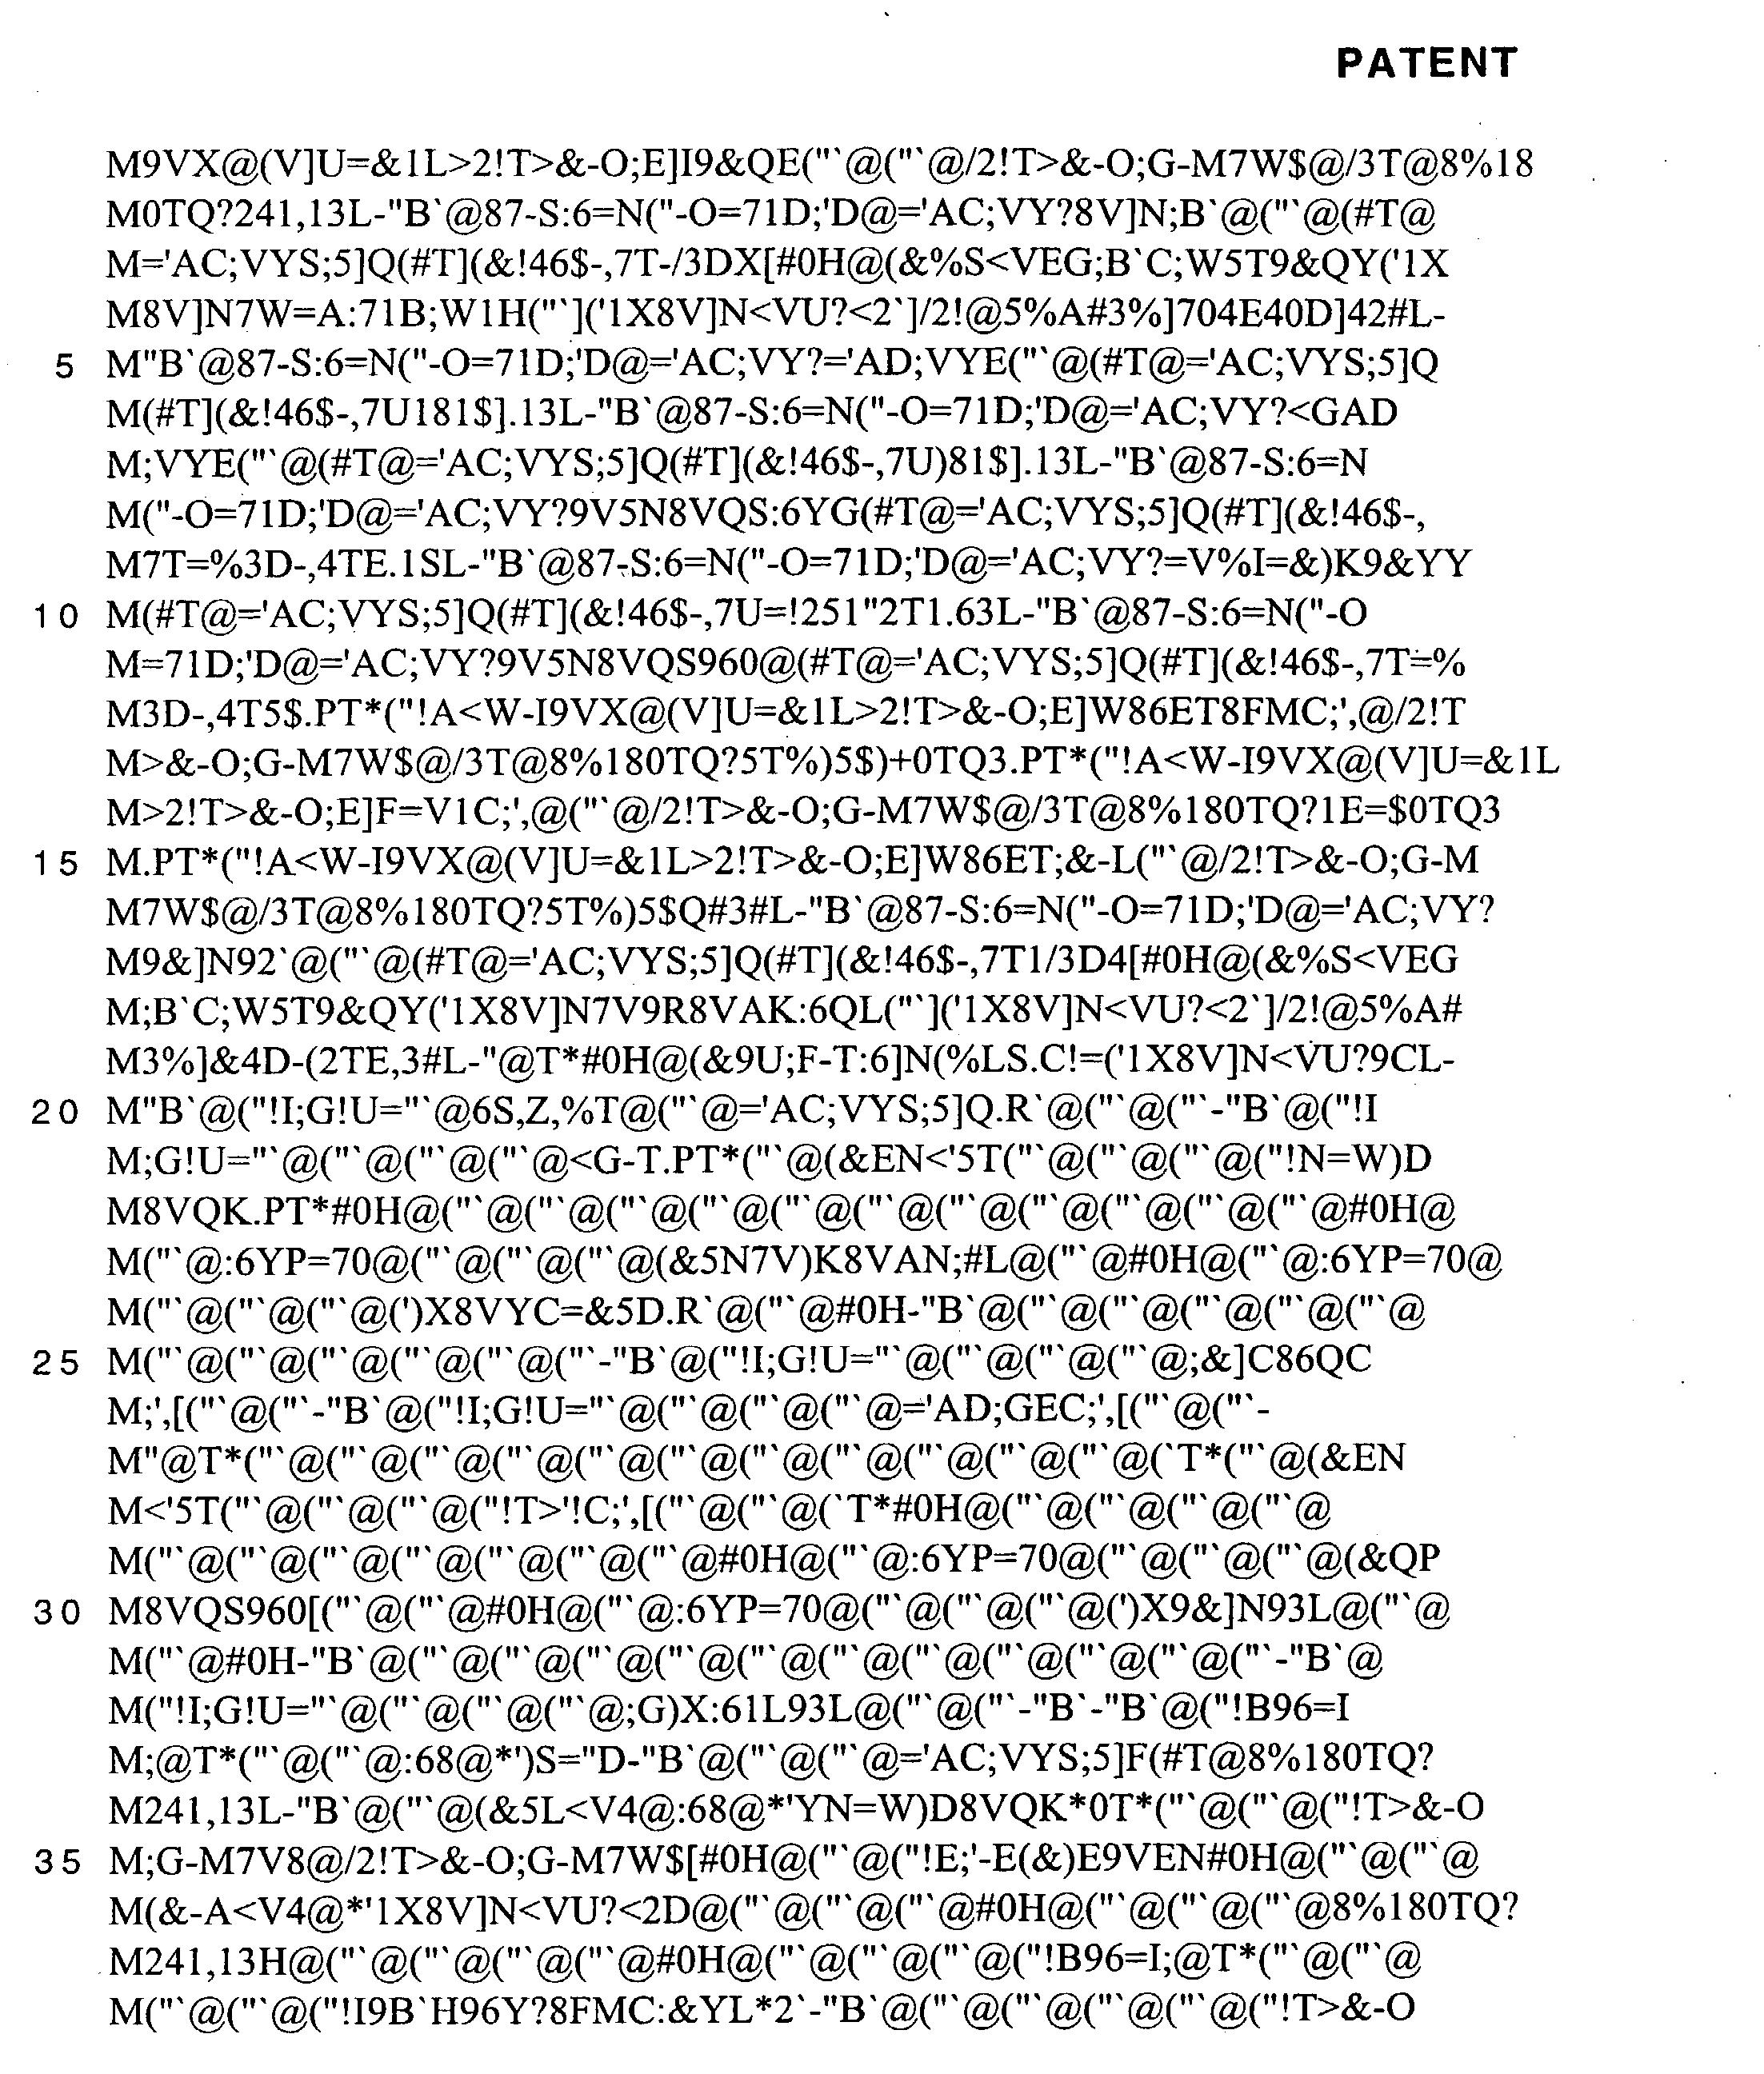 Figure US20030174721A1-20030918-P00014